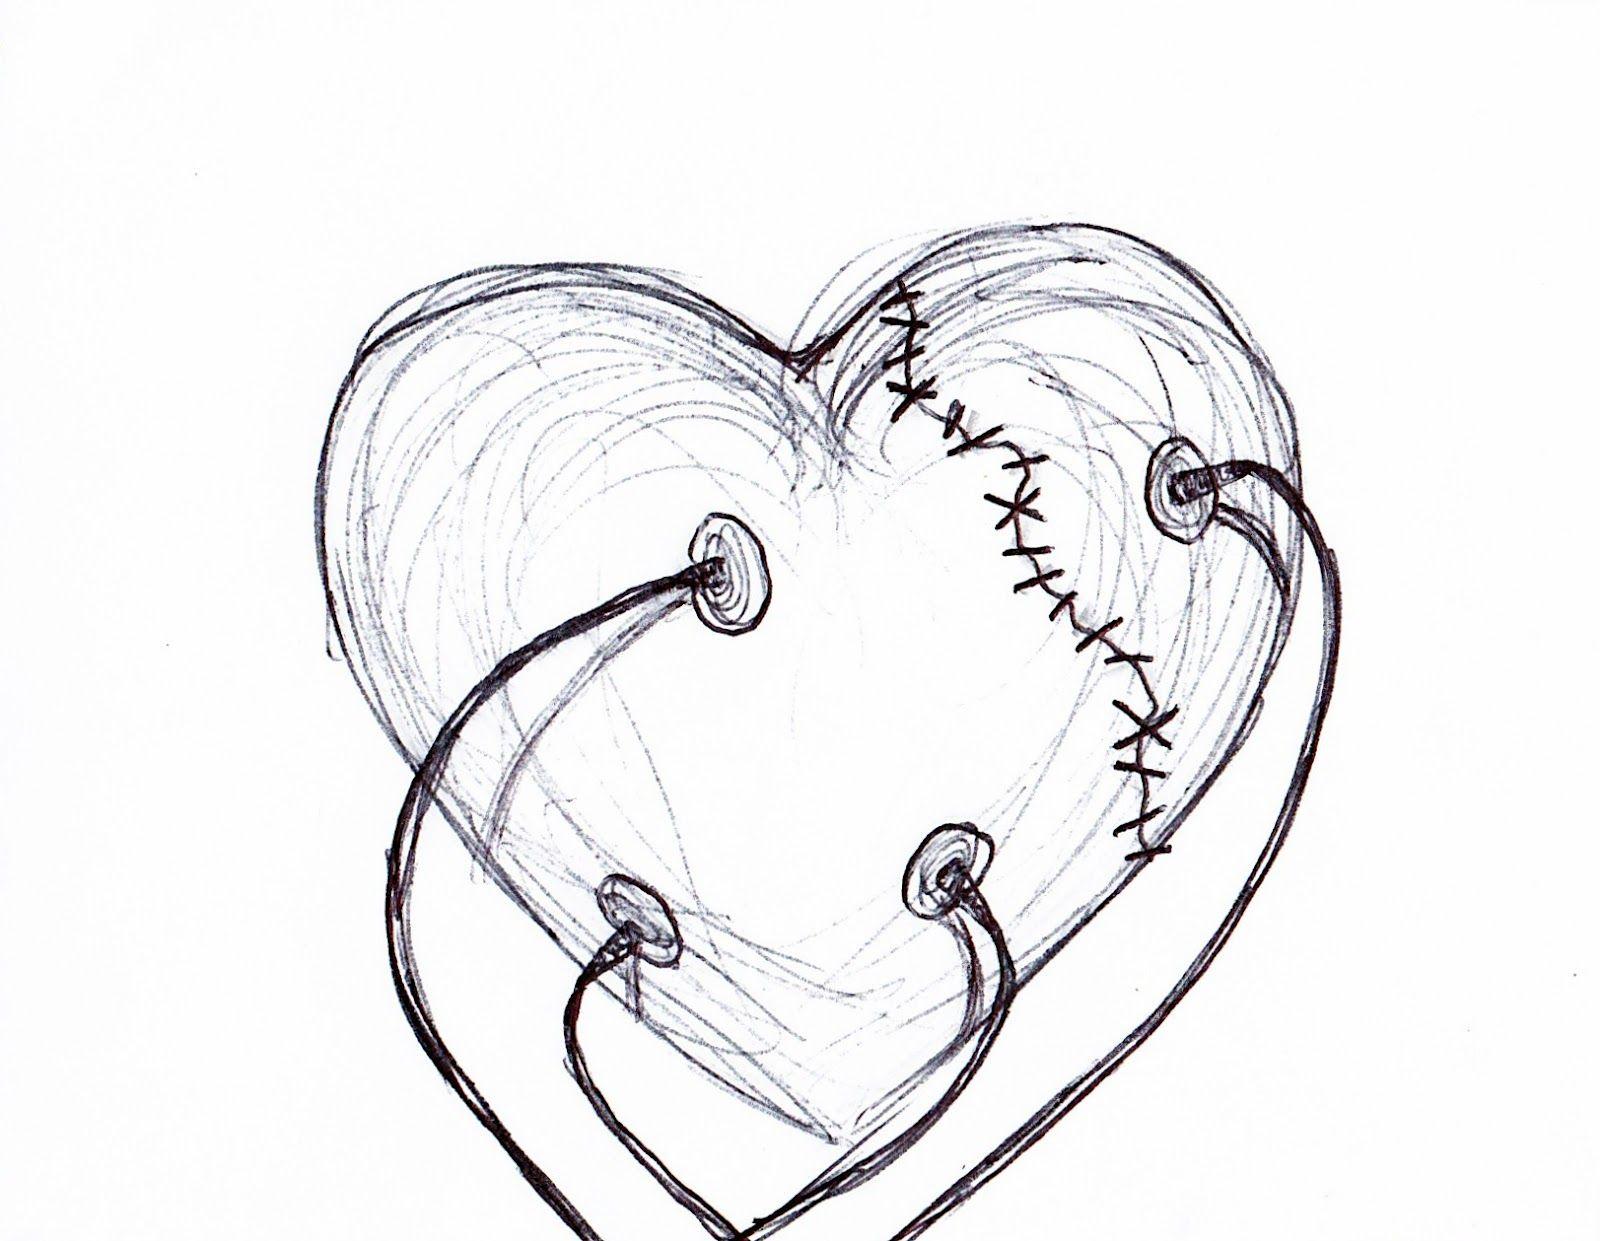 1600x1241 Broken Heart Anime Pencil Sketch Hd Pics Drawing